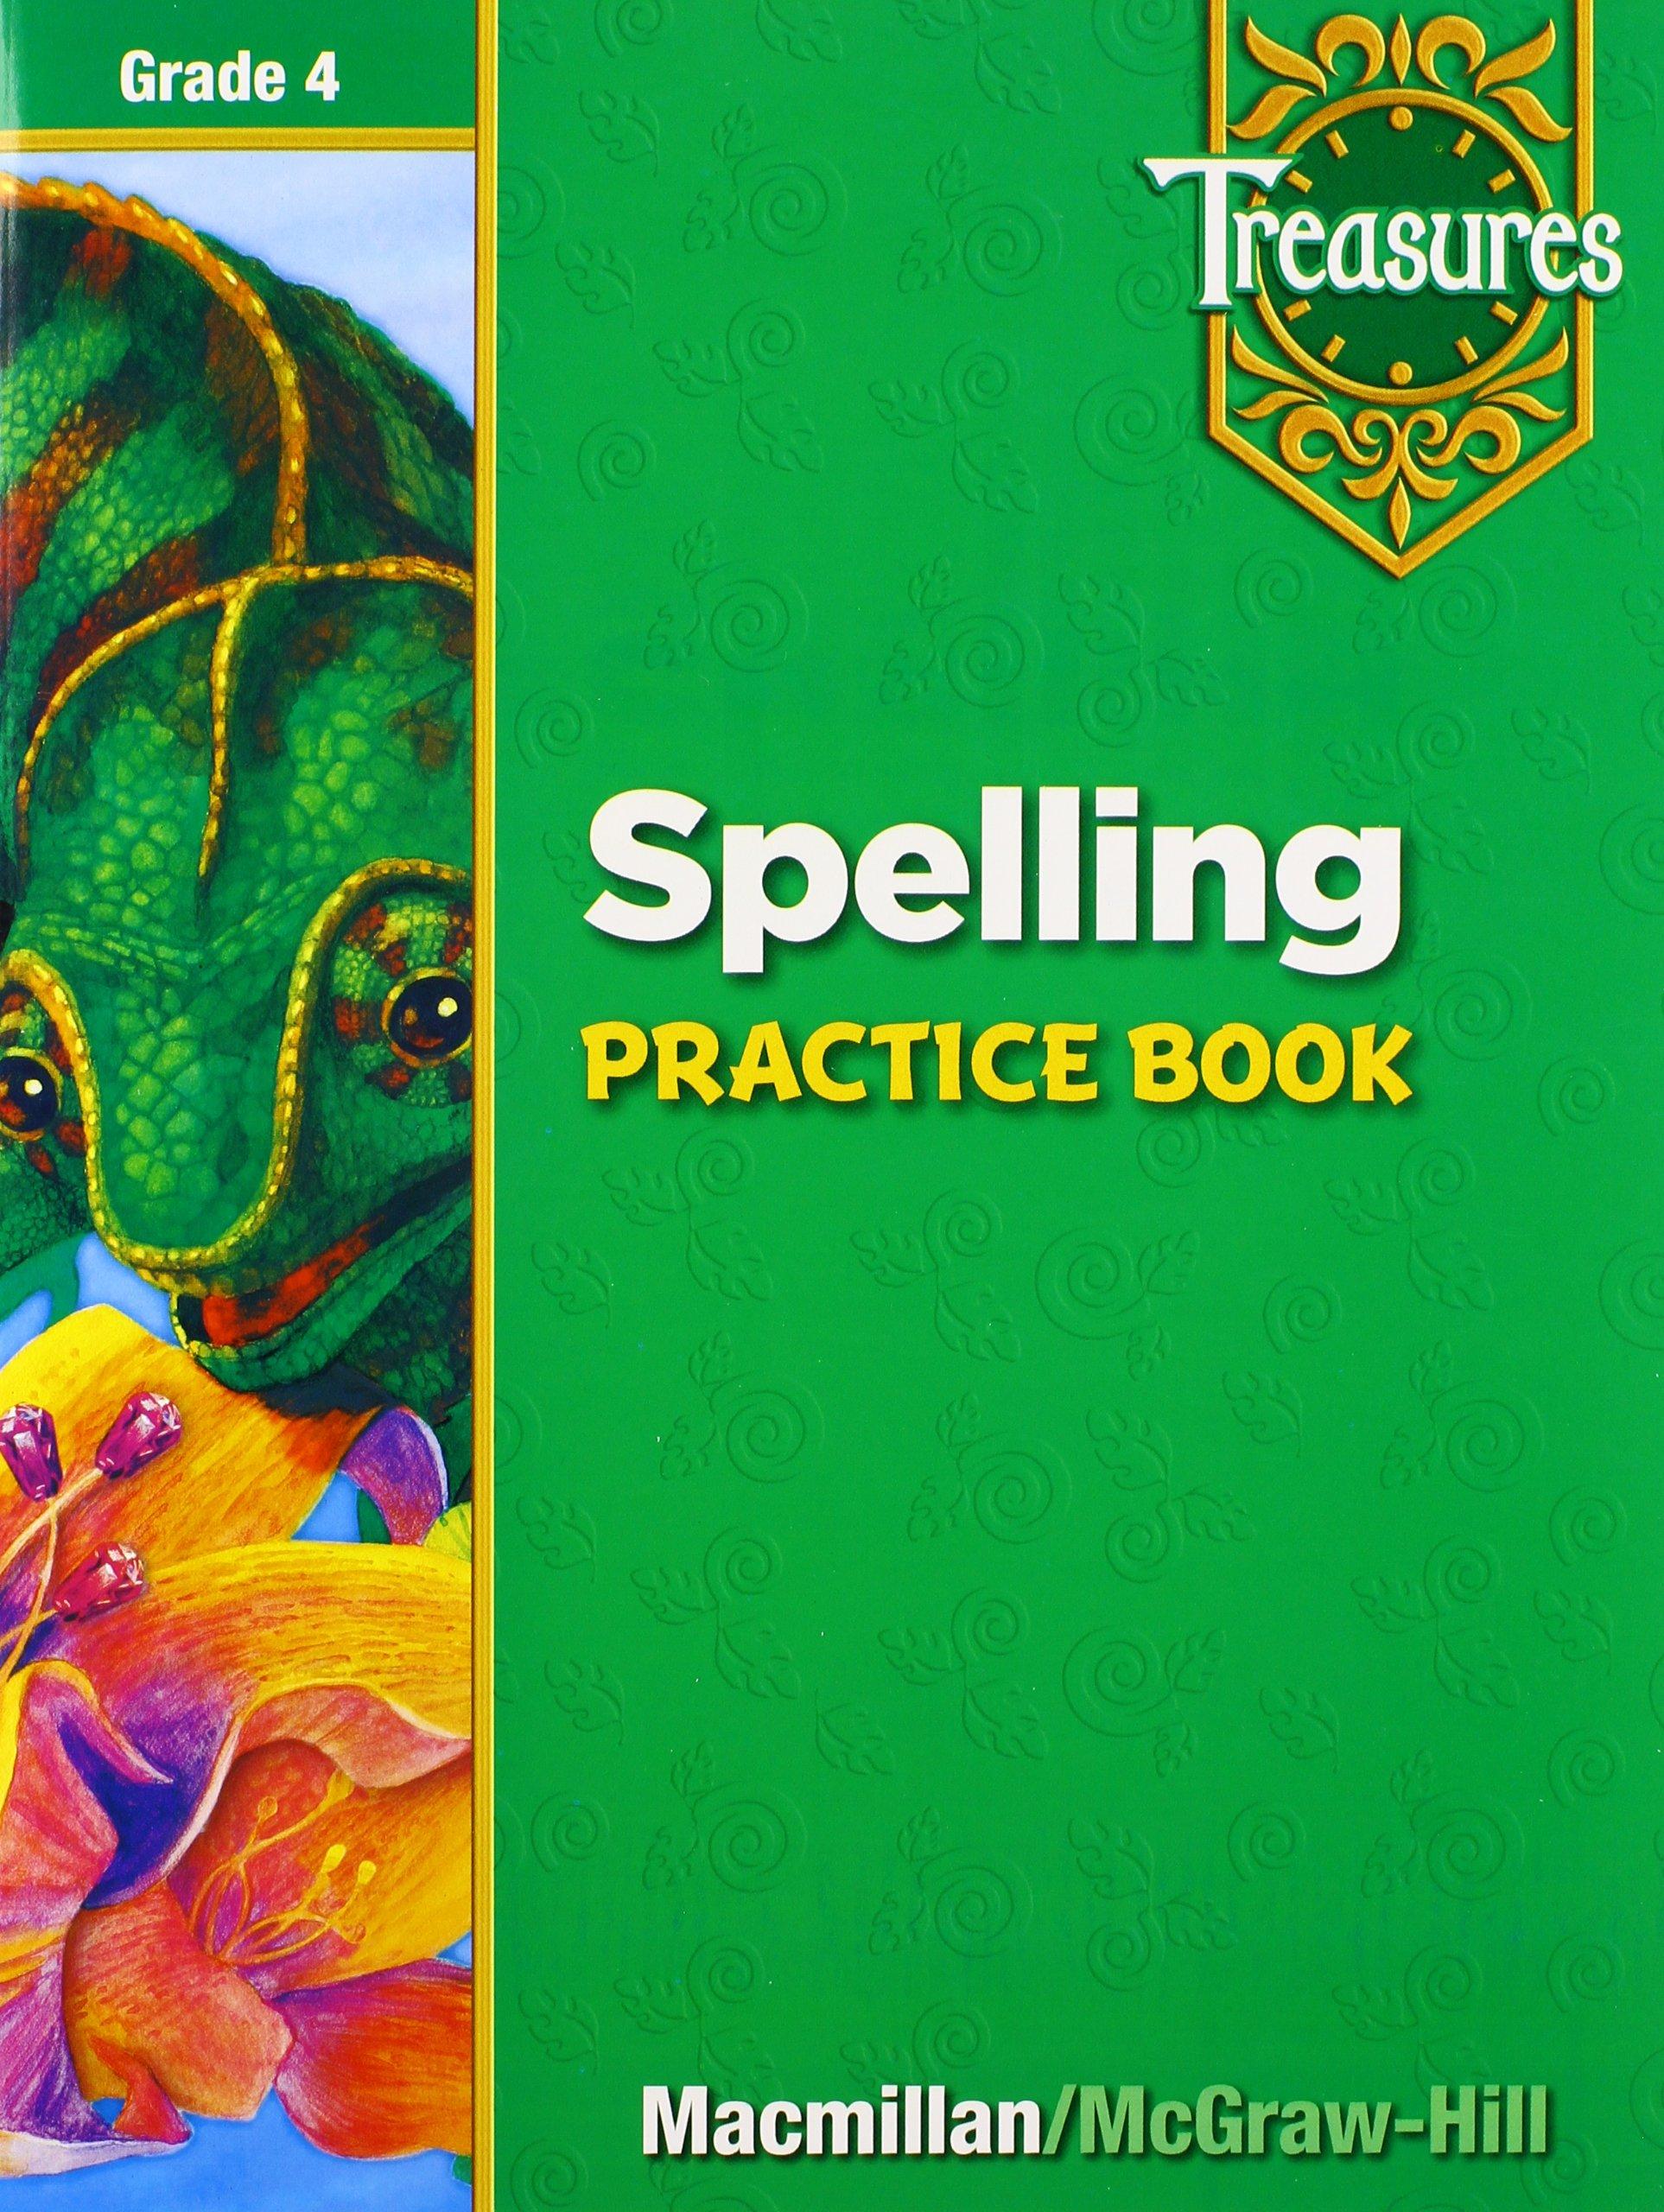 Spelling Practice Book: Grade 4 (Treasures): MacMillan